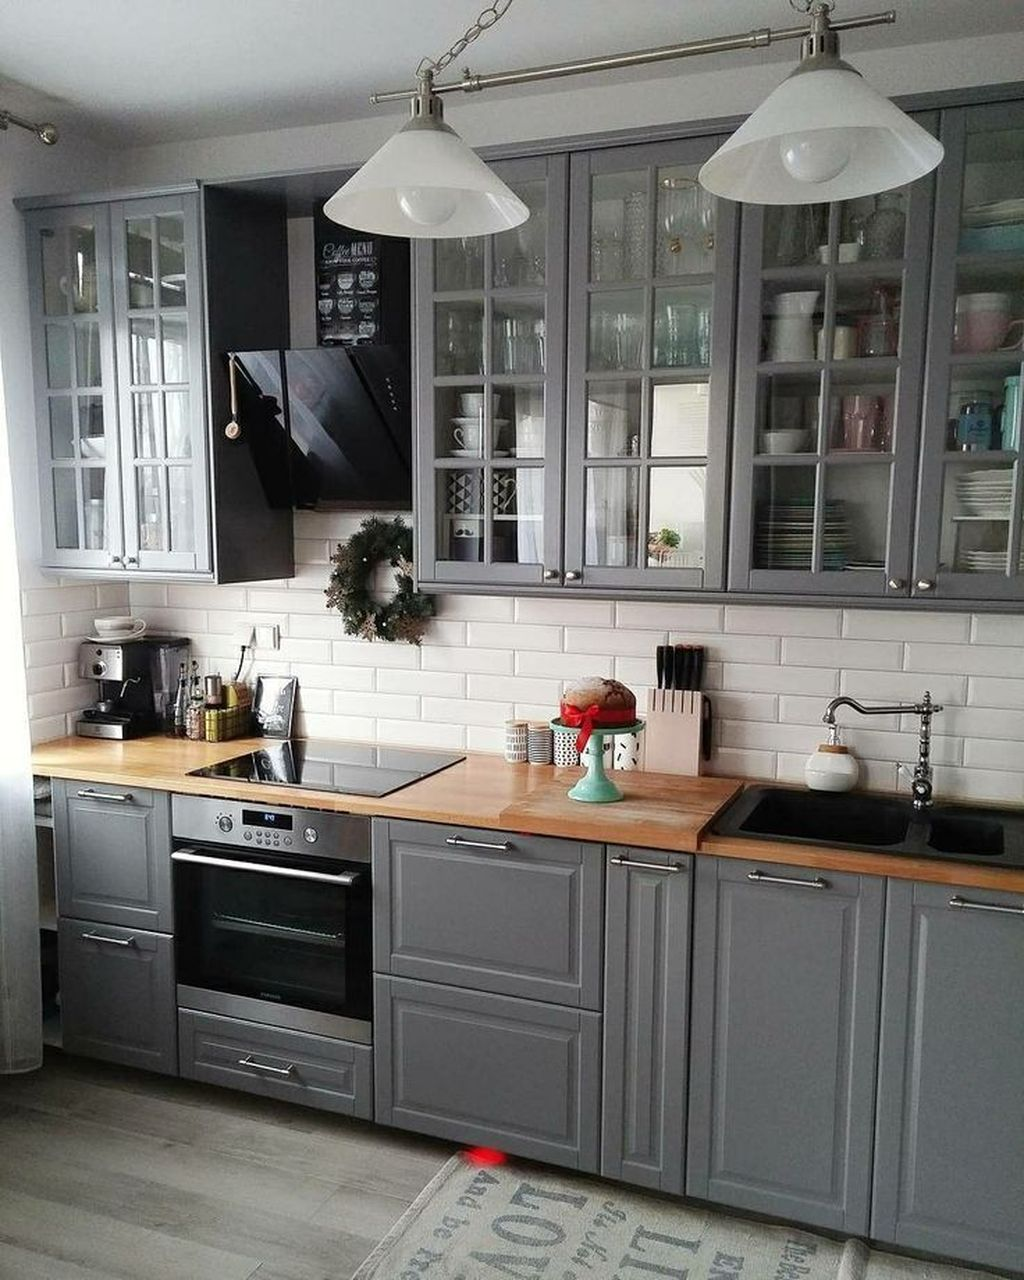 The Best Small Kitchen Design Ideas 25